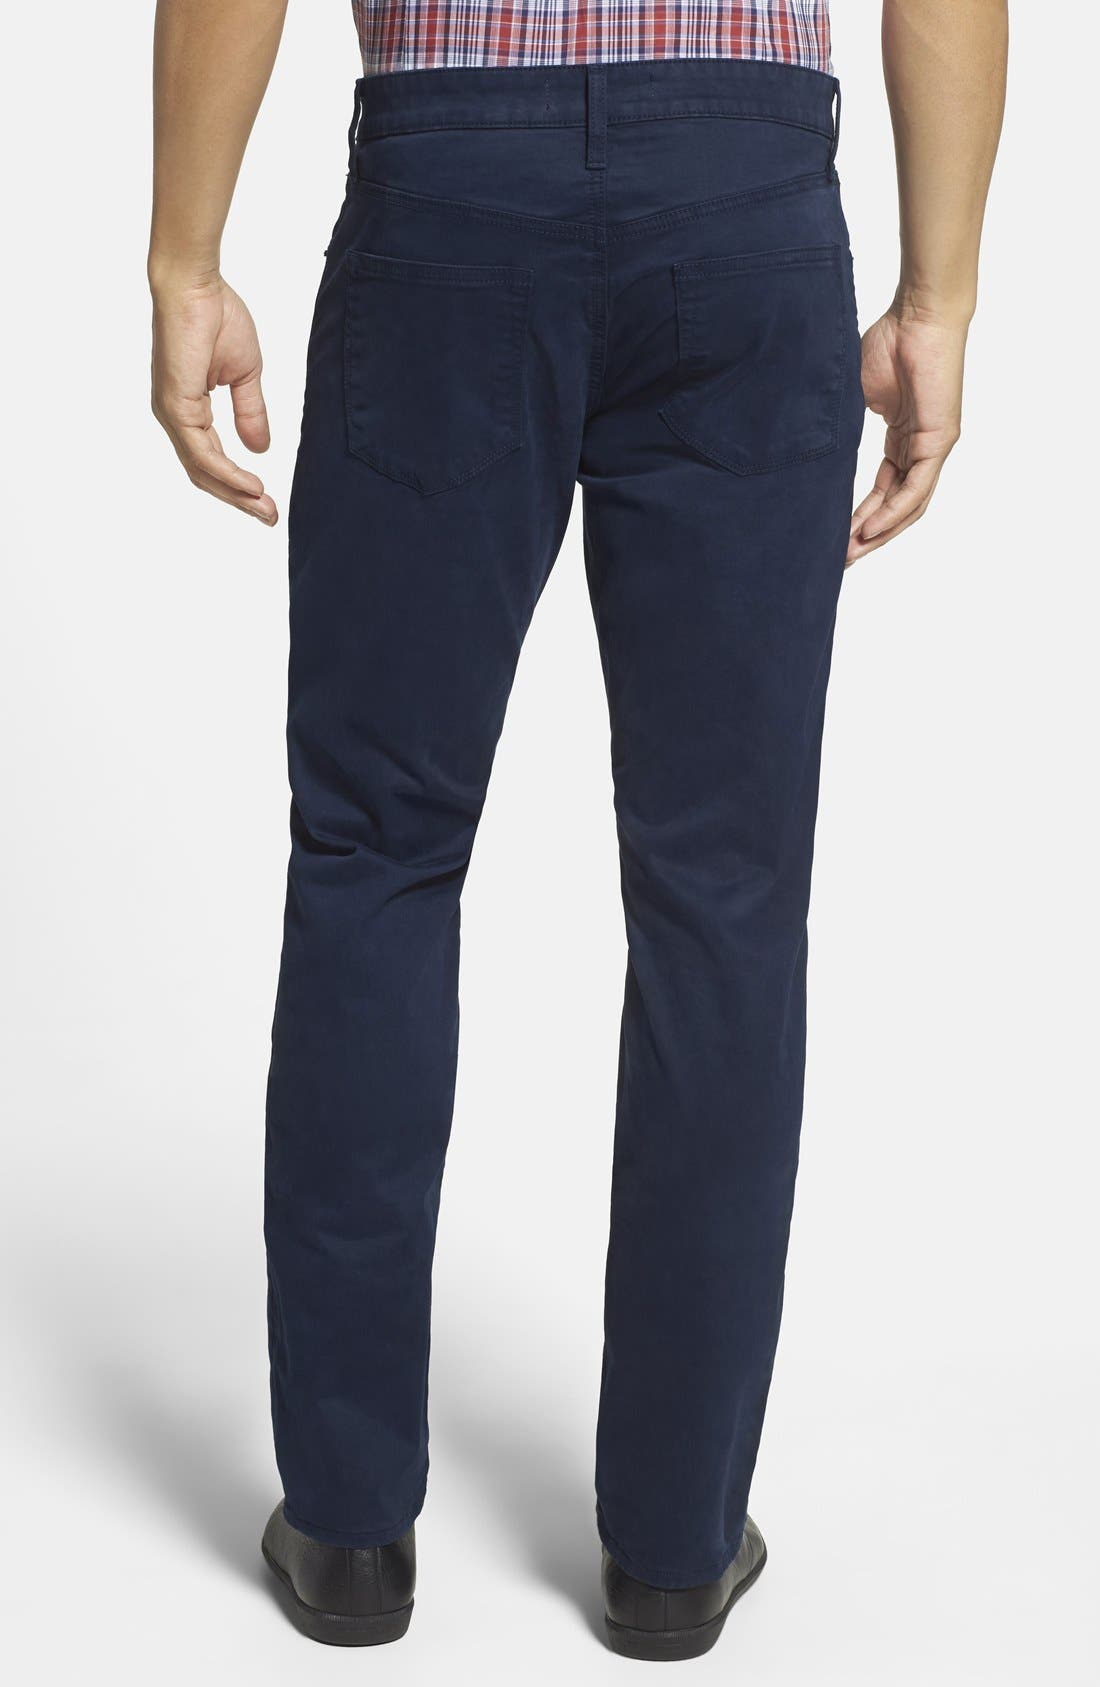 'Kane' Slim Fit Cotton Twill Pants,                             Alternate thumbnail 54, color,